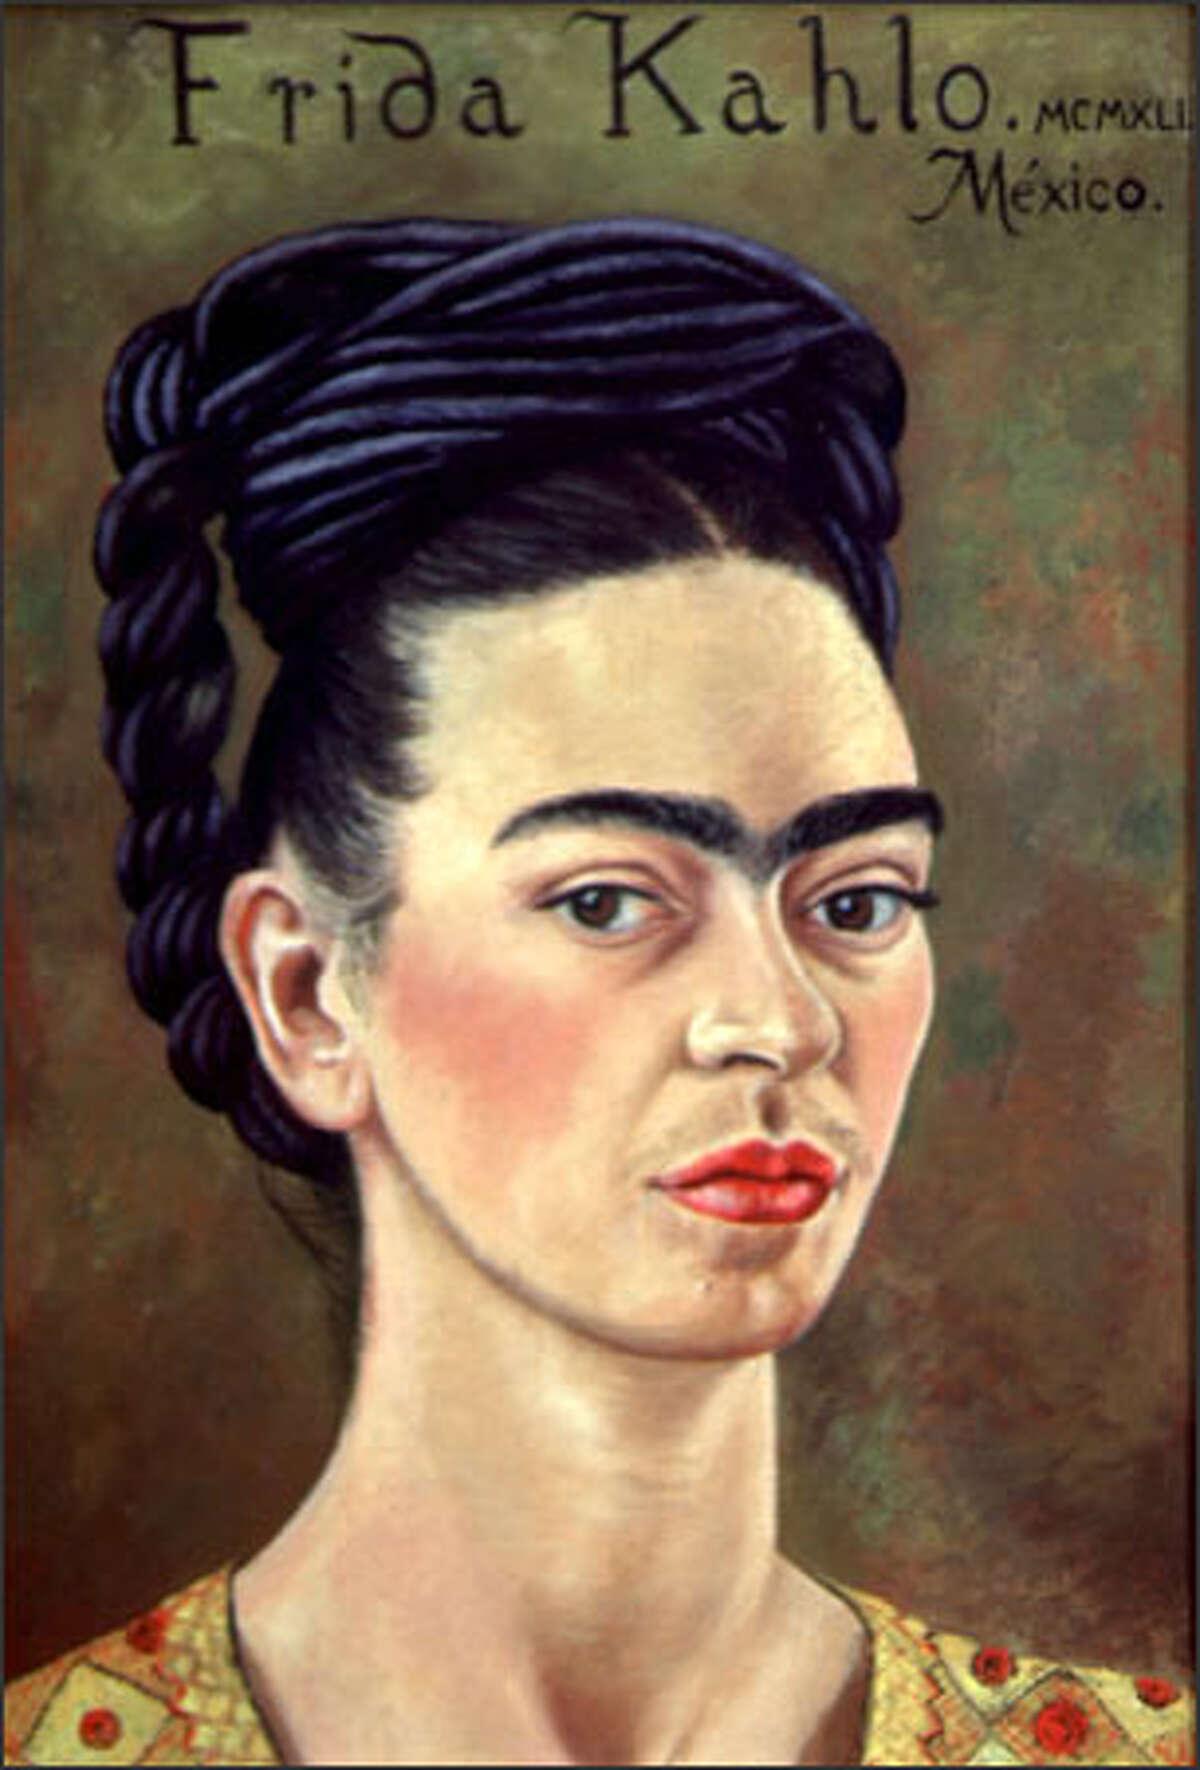 """Self-Portrait with Red and Gold Dress"" (""Autorretrato con Vestido Rojo y Dorado""), 1941. Oil on canvas, 39 x 27.5 cm. Courtesy of the Vergel Foundation, New York. © 2002 Banco de Mexico, Diego Rivera & Frida Kahlo Museum Trust."